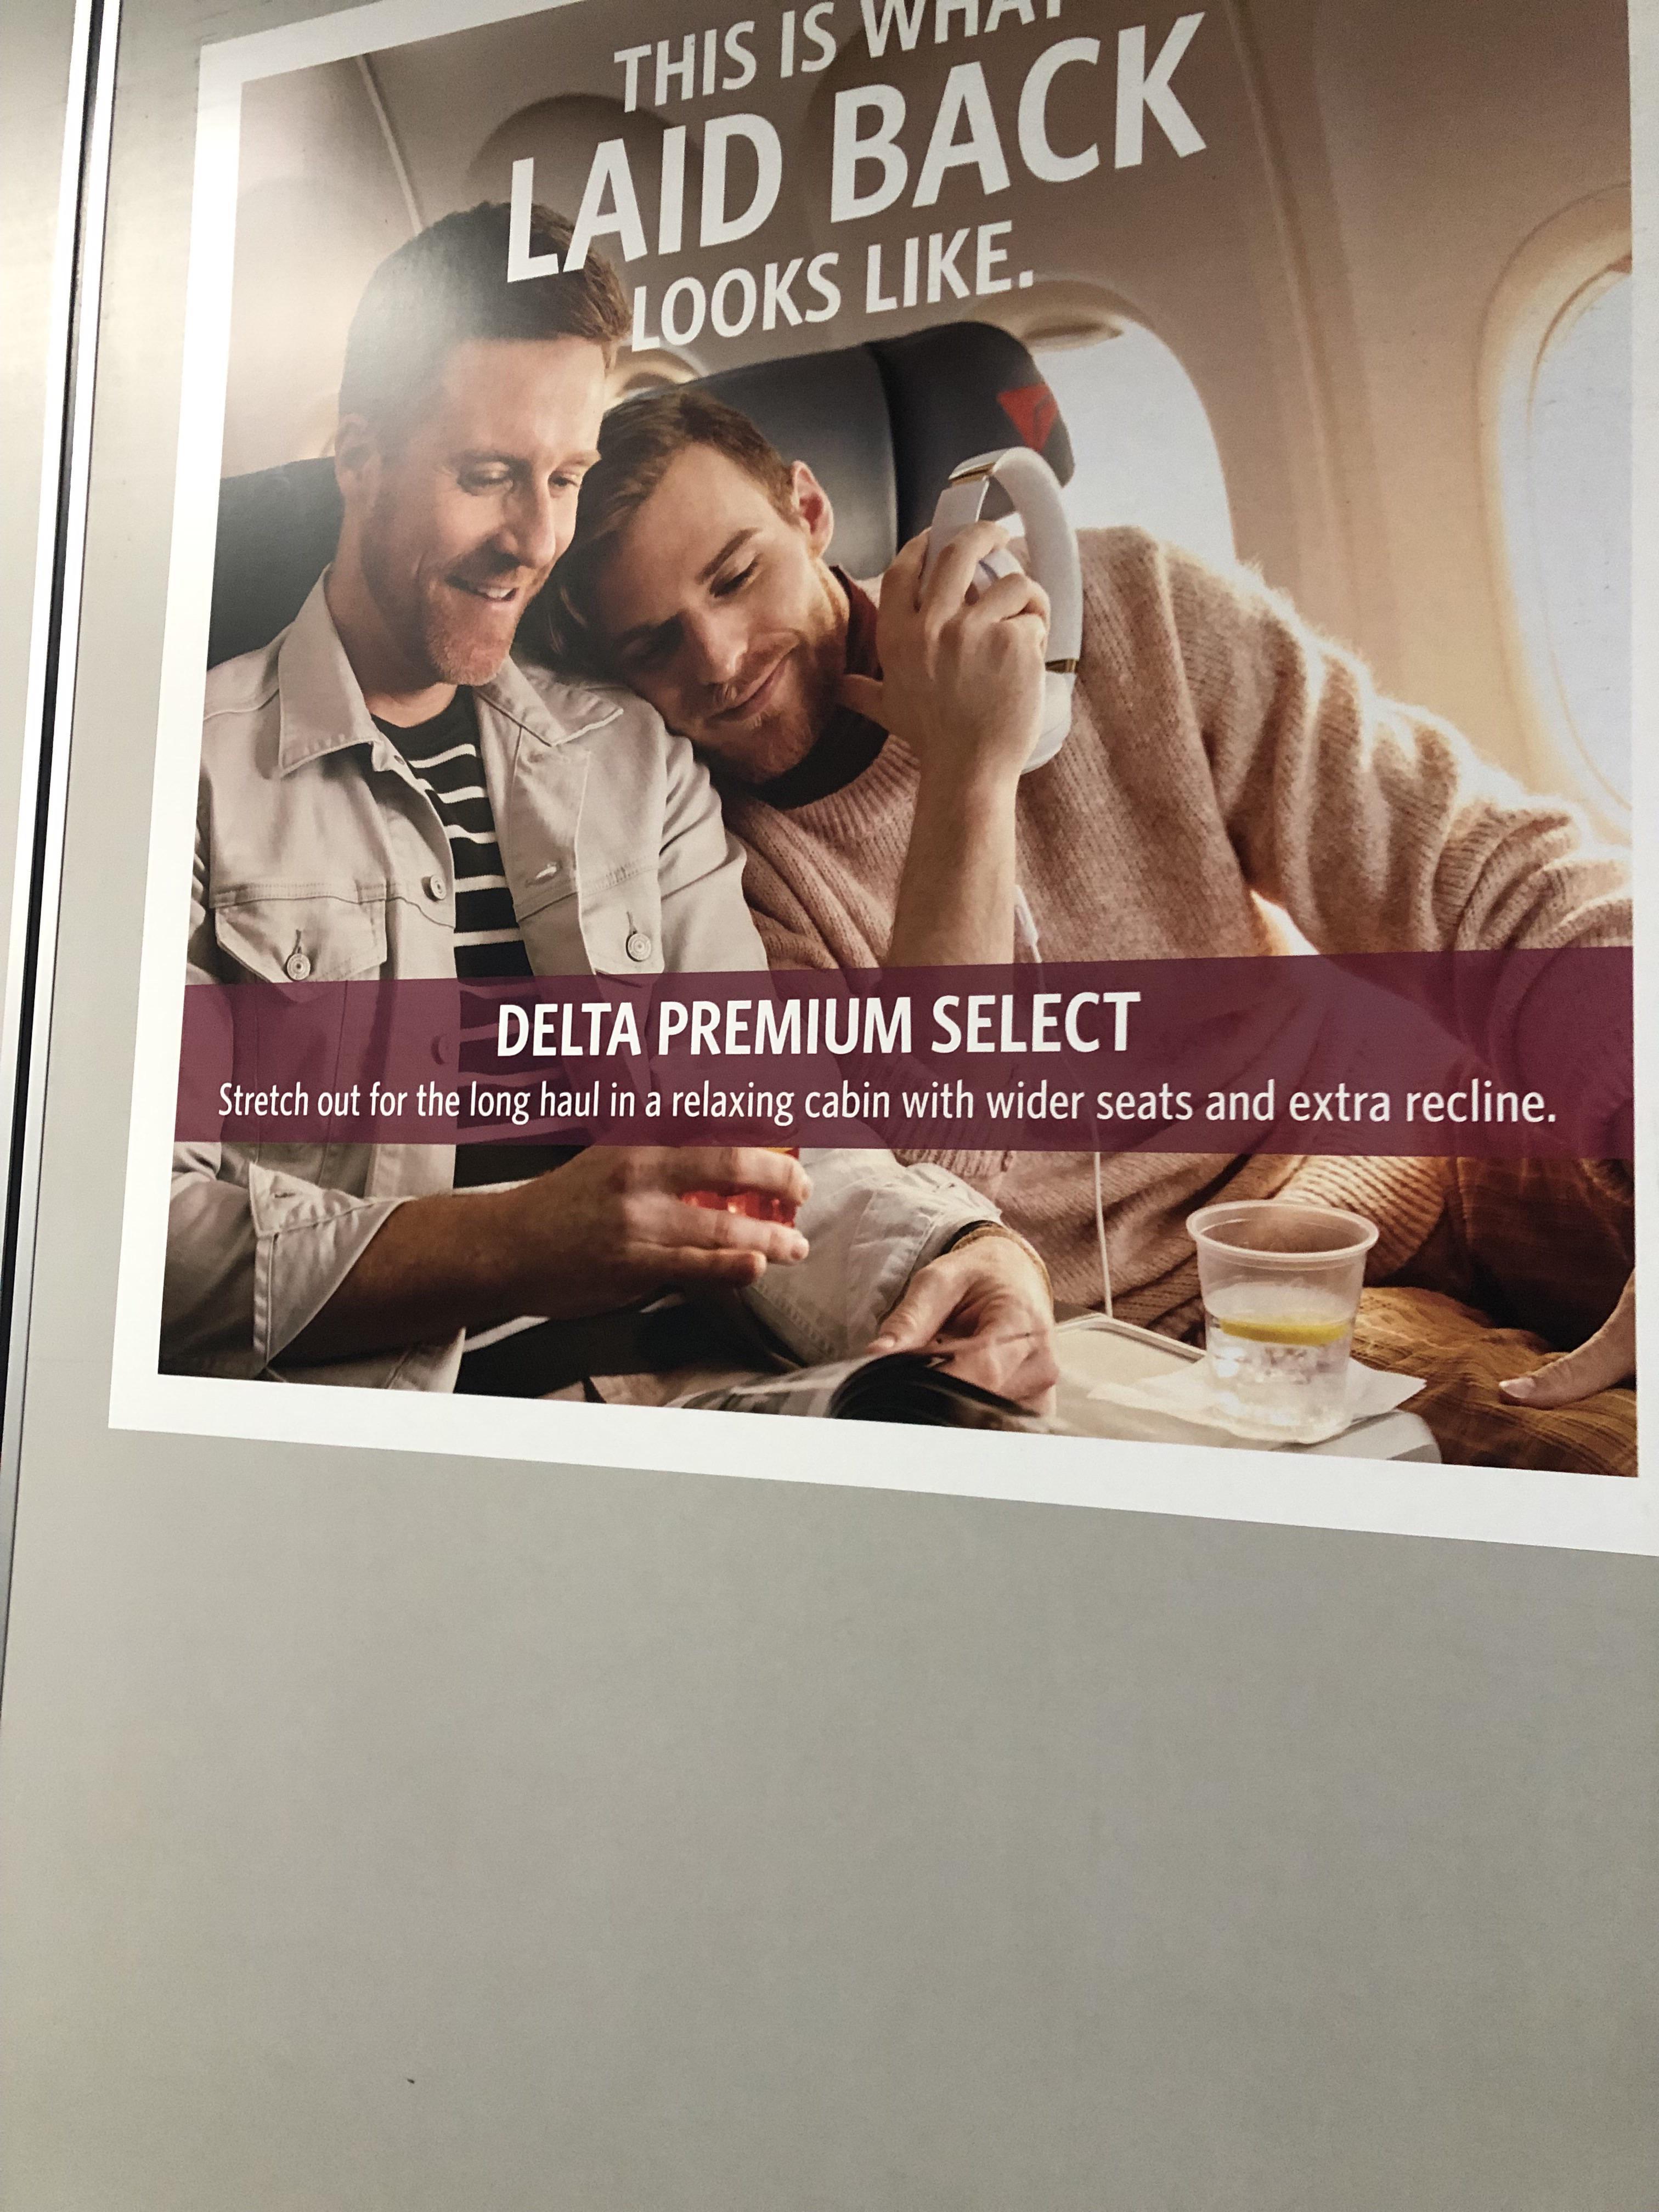 delta poster w gay representation made